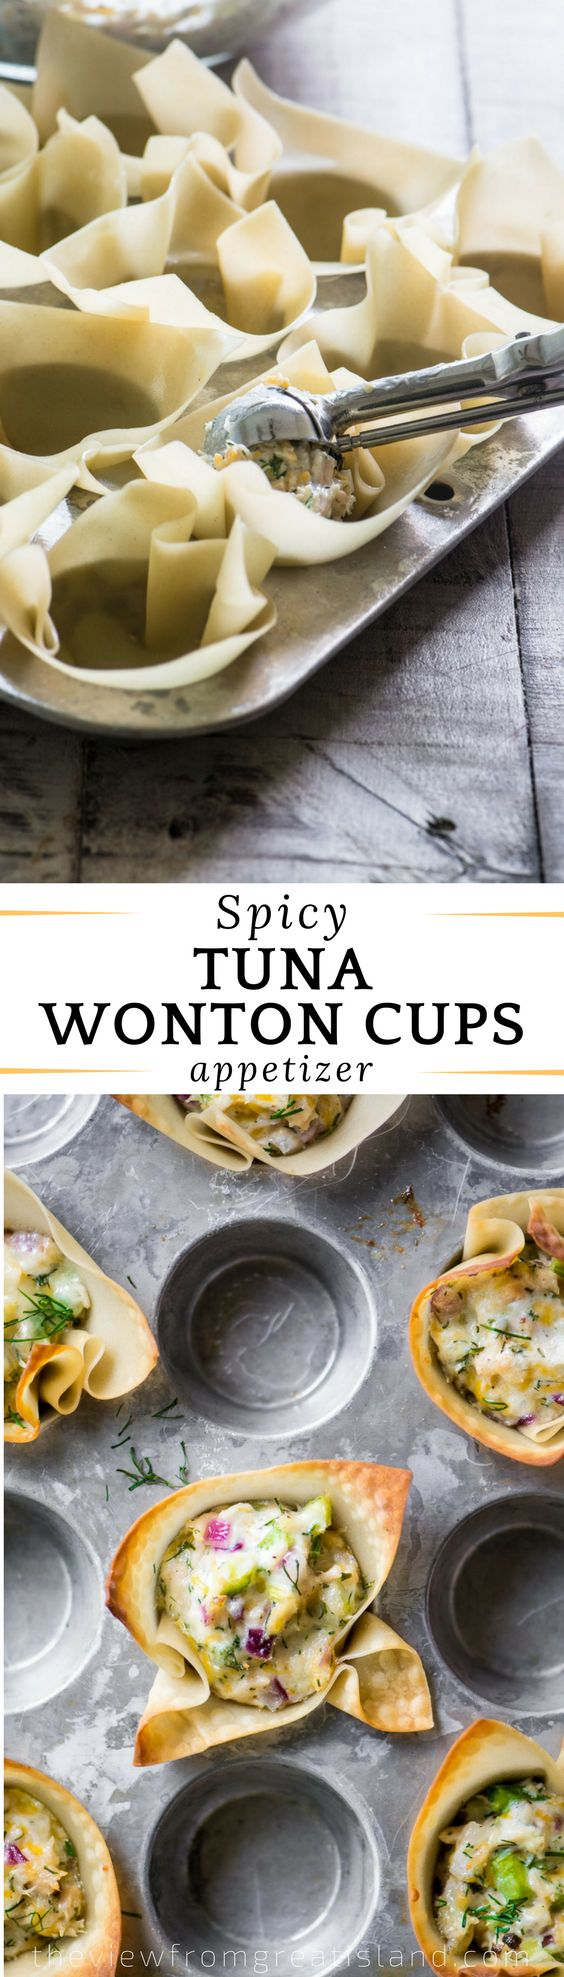 Spicy Tuna Wonton Cups